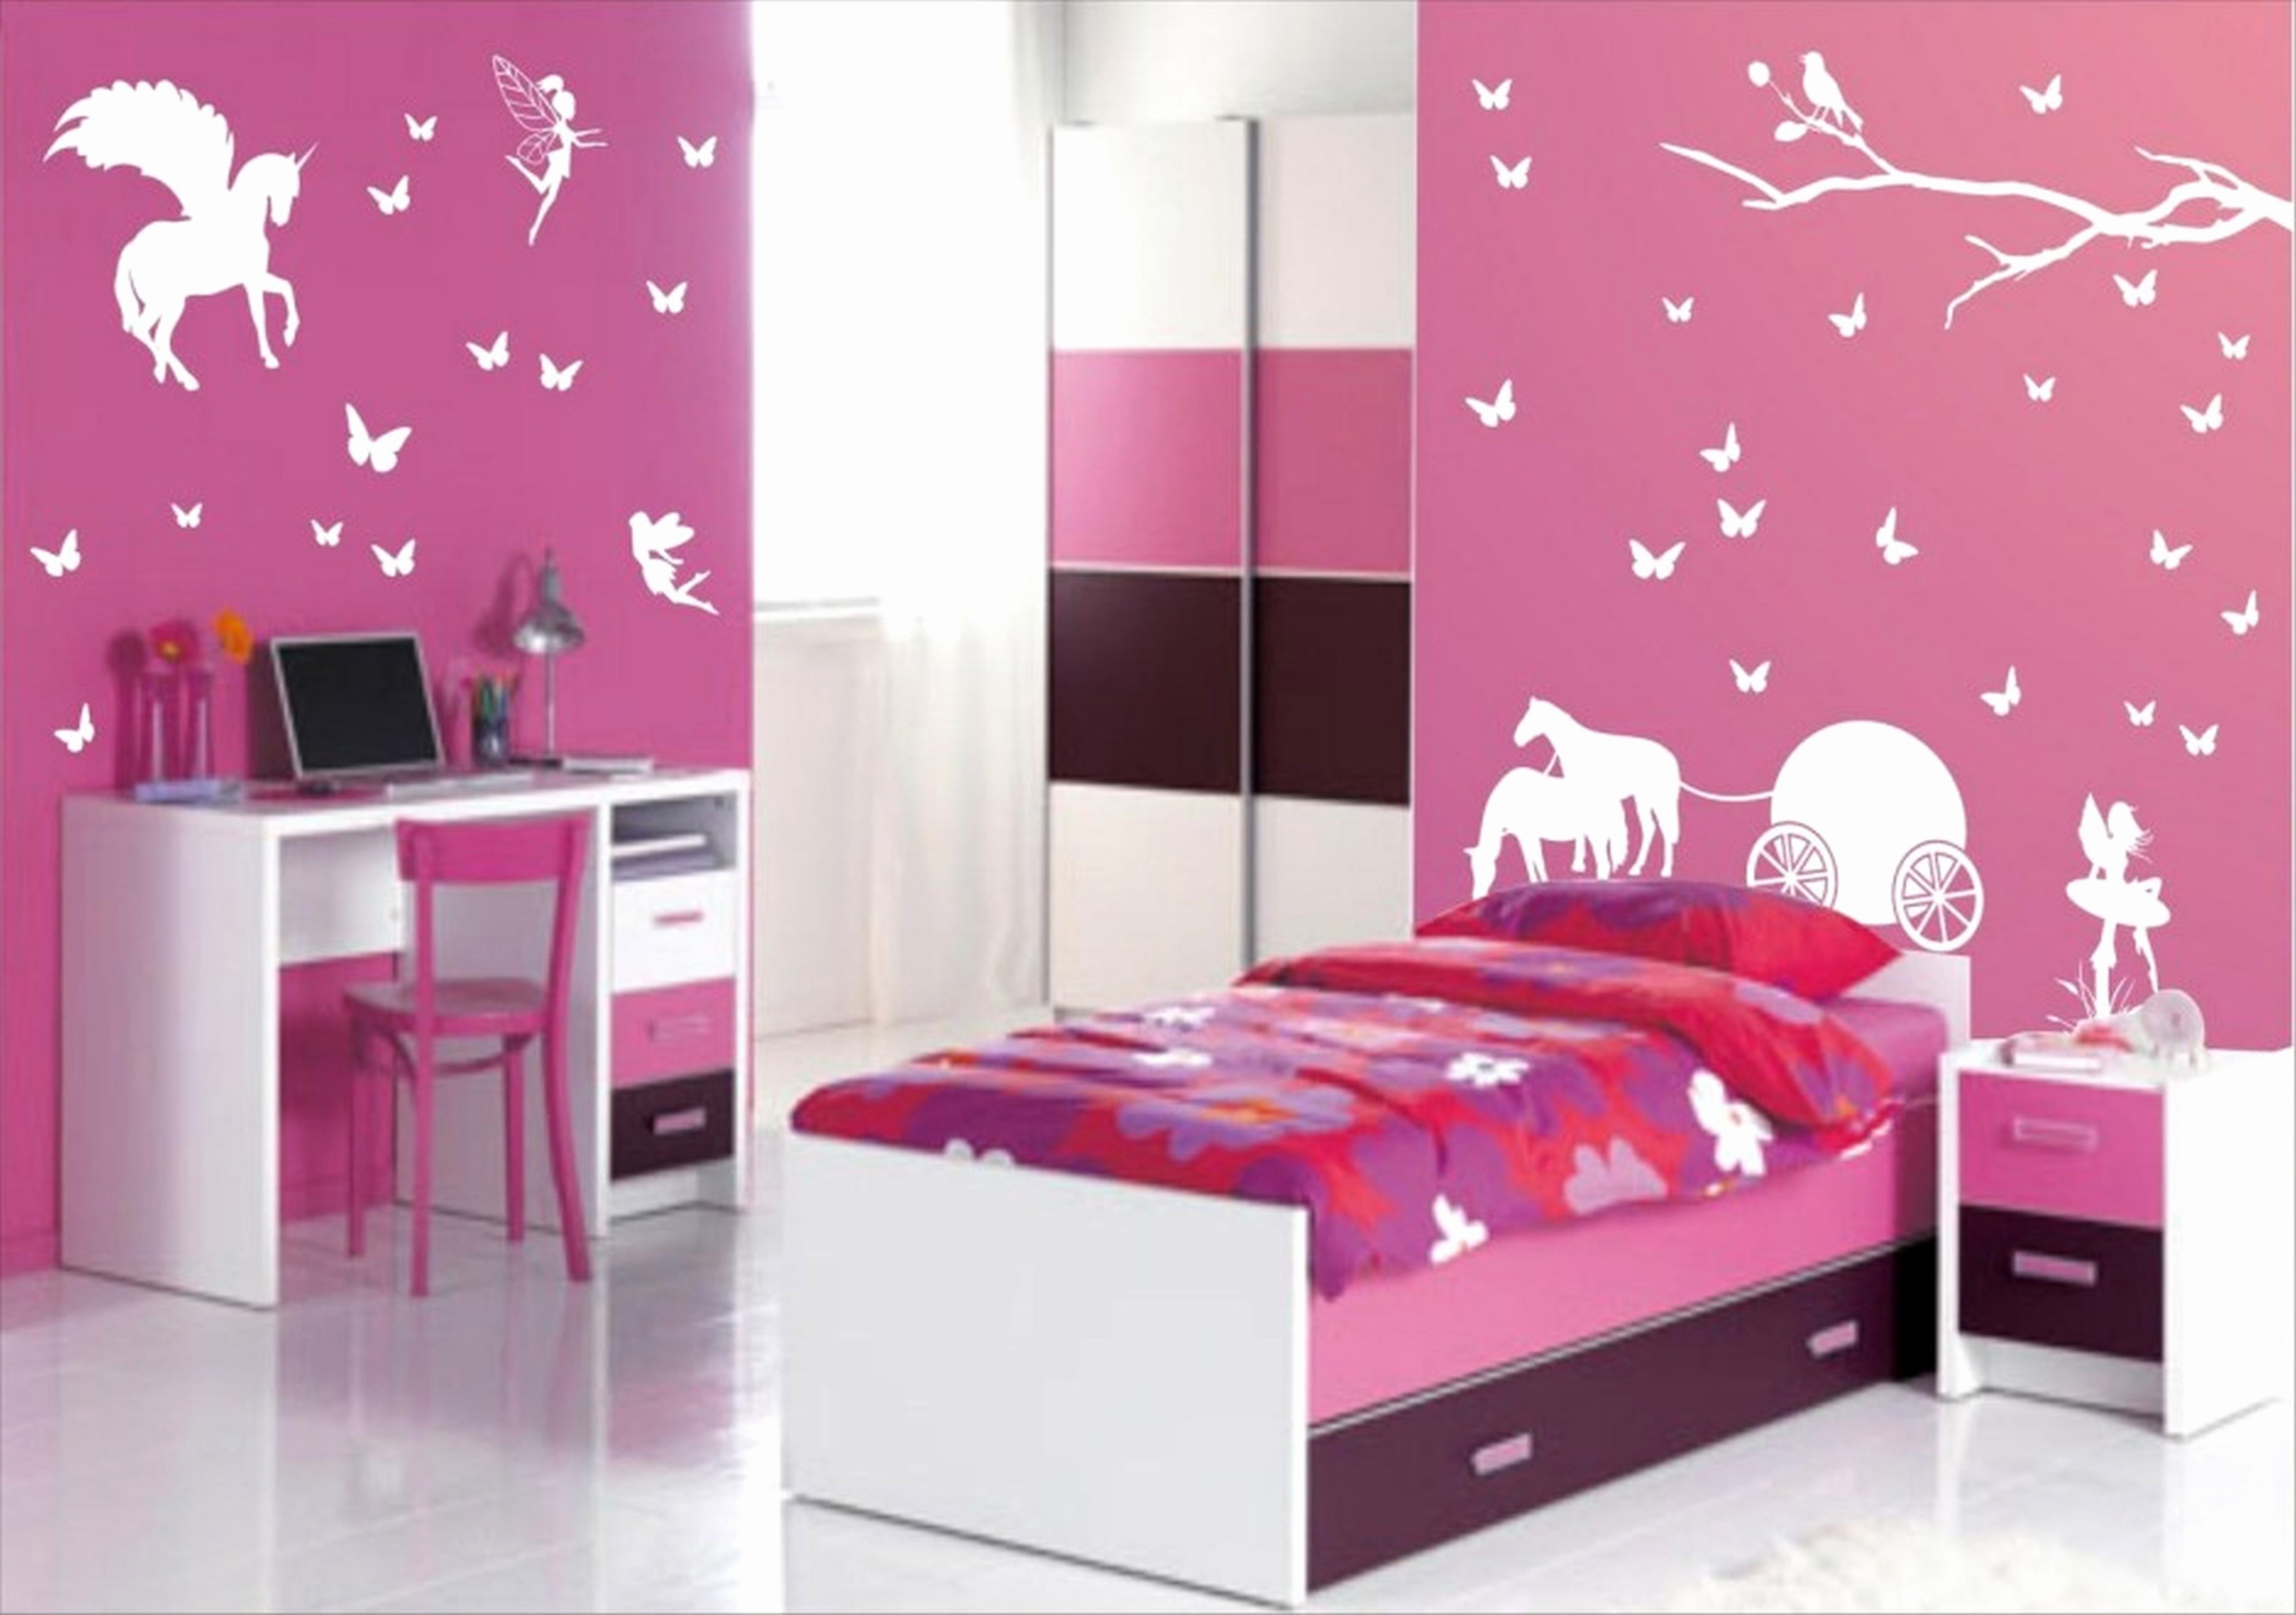 10 Wonderful Painting Ideas For Girls Room girl child room design new bedroom minecraft bedroom decor girls 2020